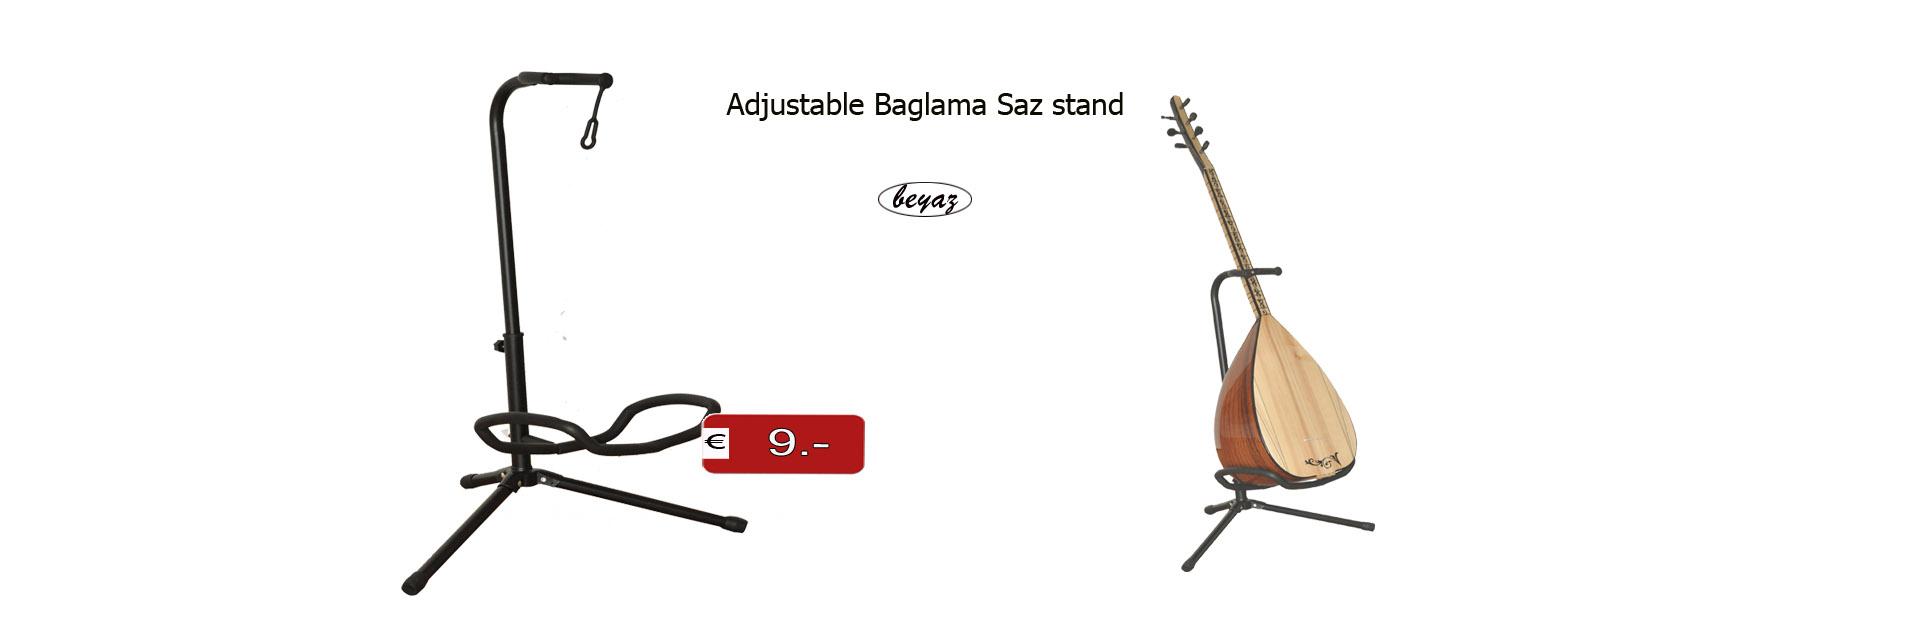 Saz Baglama Stand